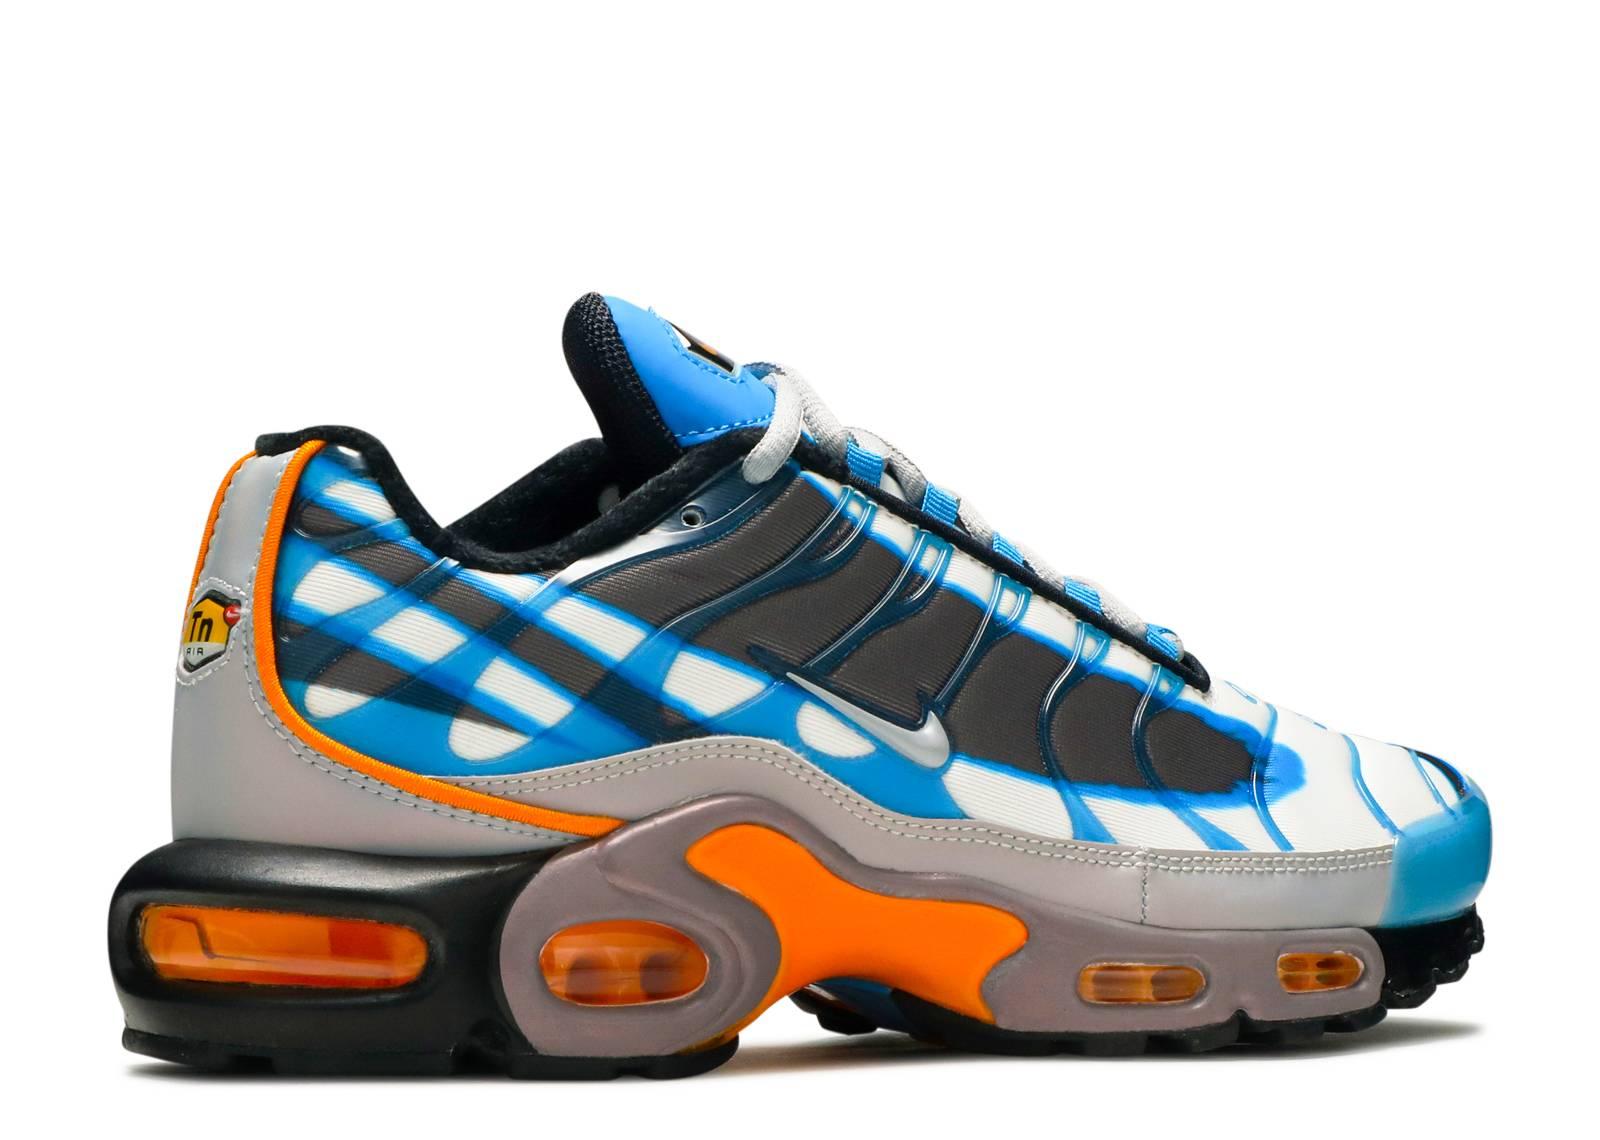 Air Max Plus Premium 'Photo Blue' - Nike - 815994 400 - photo blue/wolf  grey-orange peel-black   Flight Club